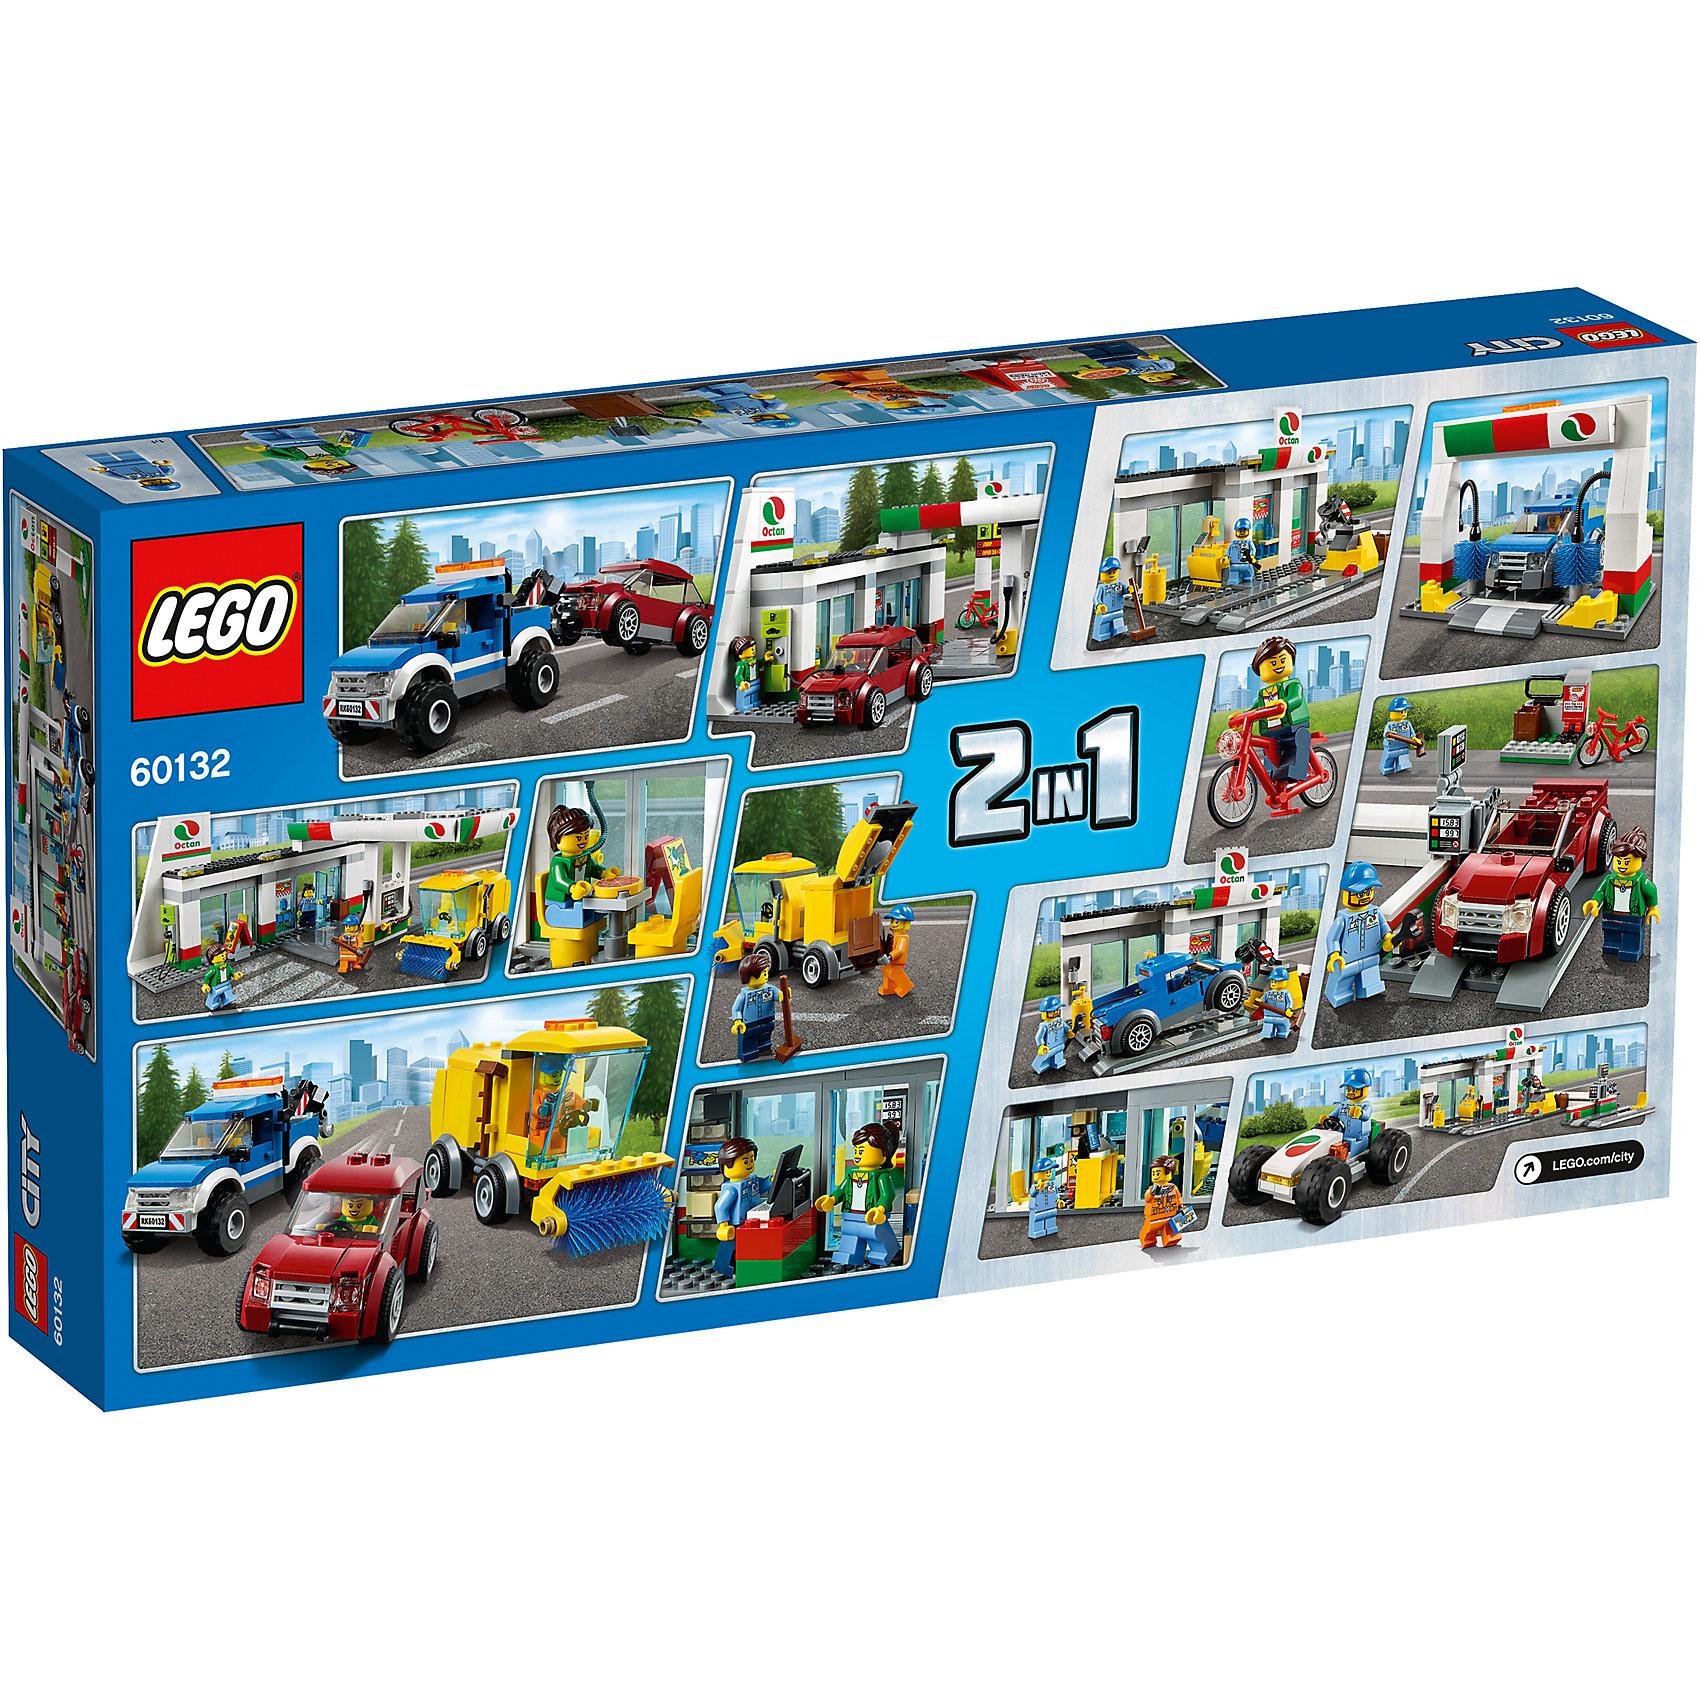 LEGO City 60132: Станция технического обслуживания от myToys